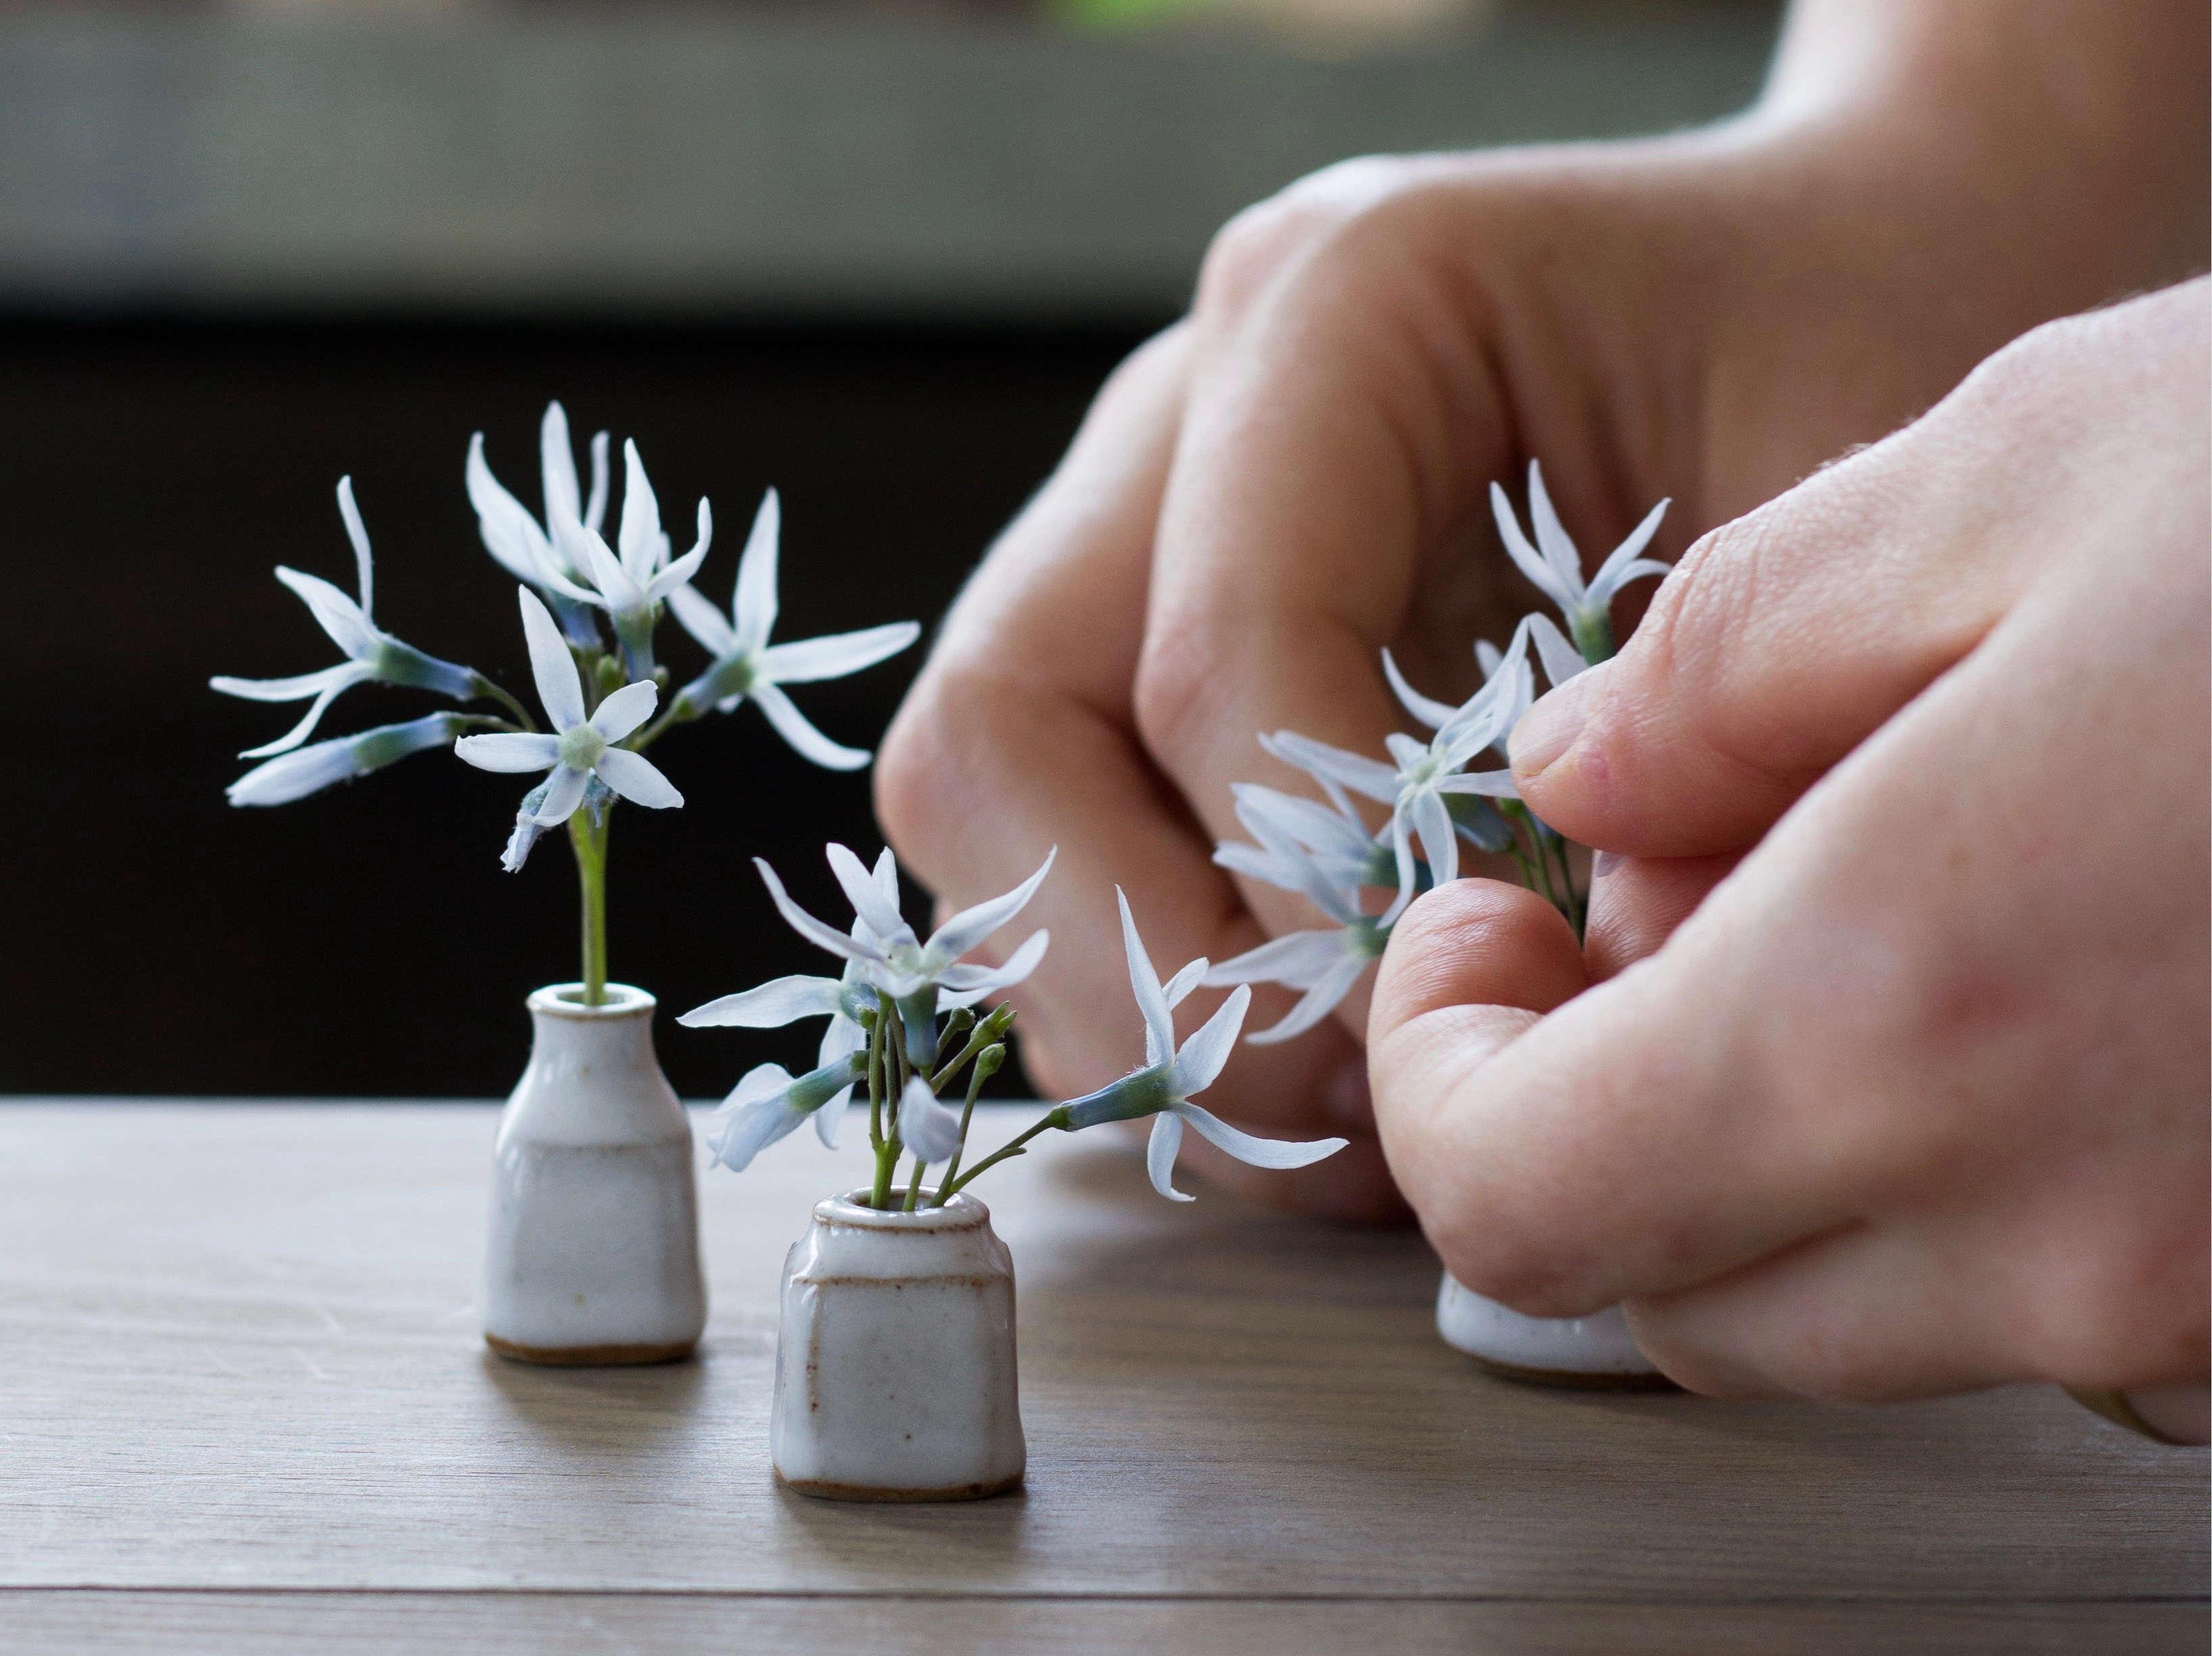 Tiny Bouquets 8 Ideas For Floral Arrangements In Miniature Vases Gardenista